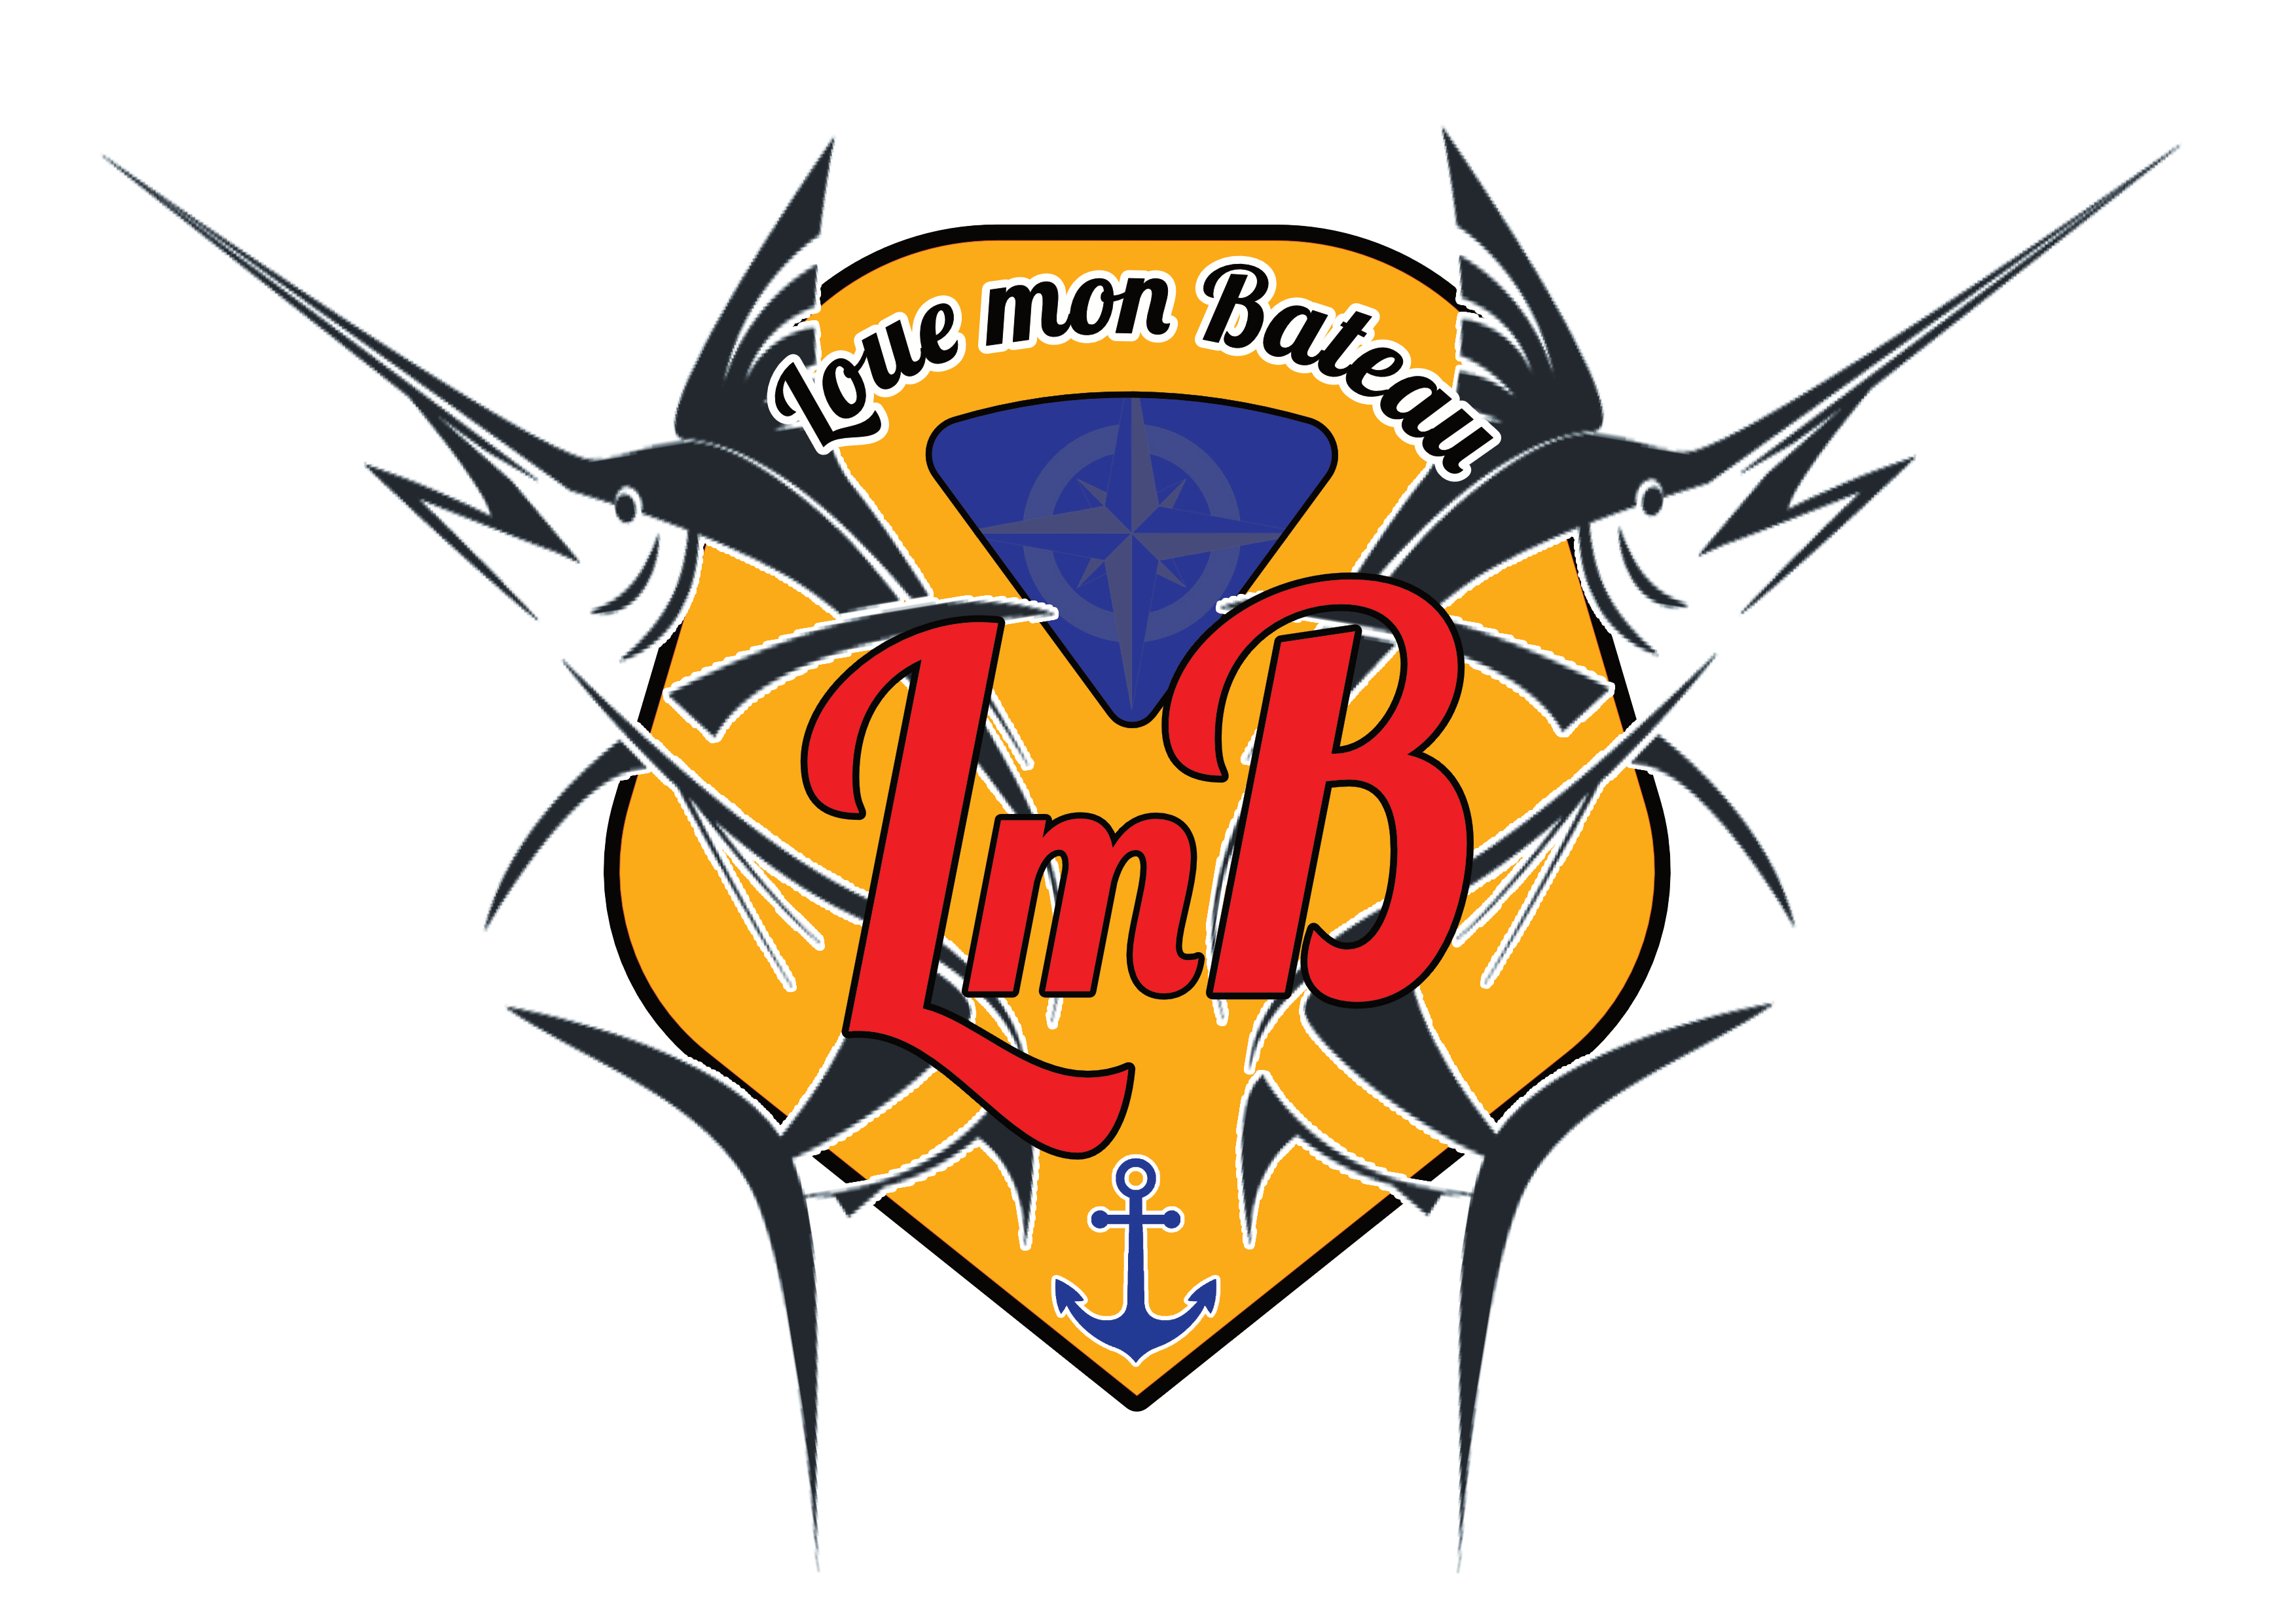 Lmb-France